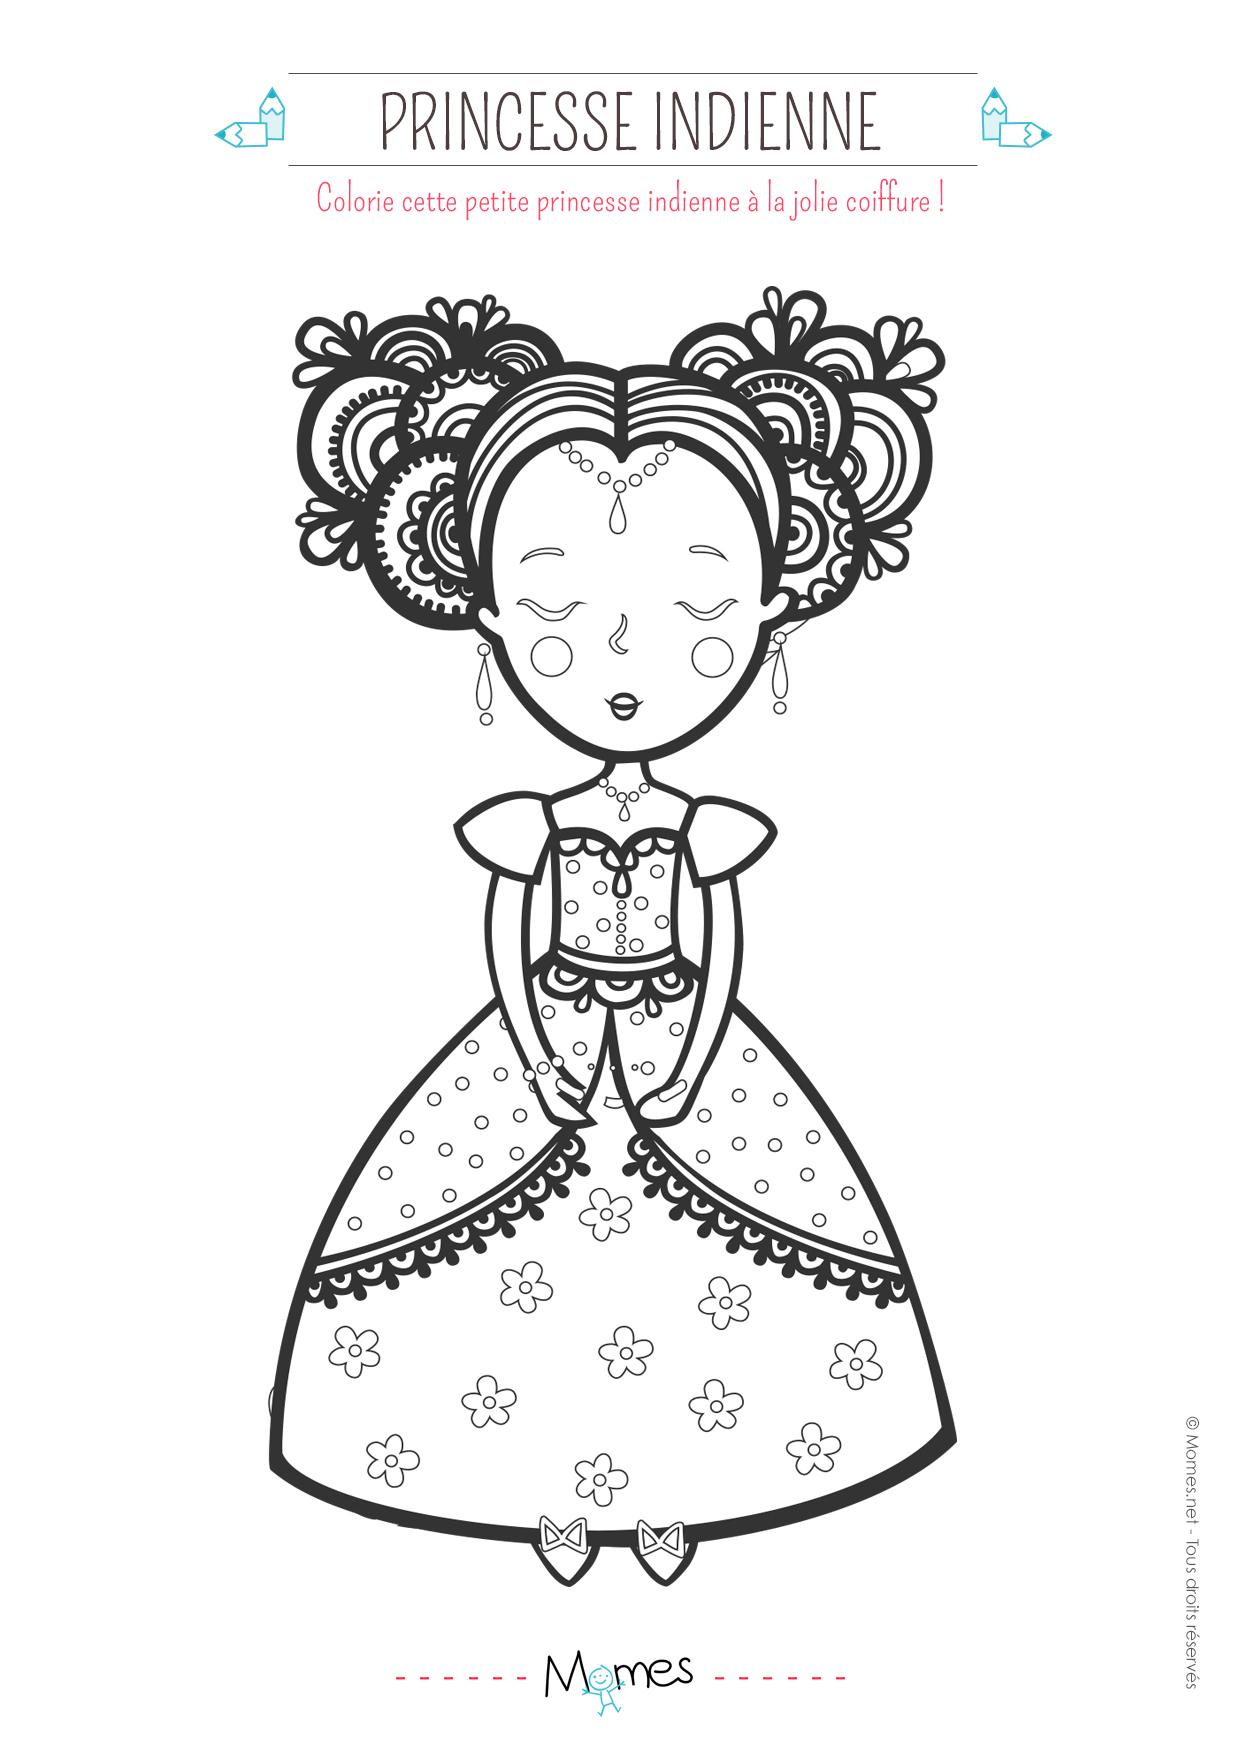 Coloriage Princesse Indienne - Momes encequiconcerne Coloriage Princesse Sirene